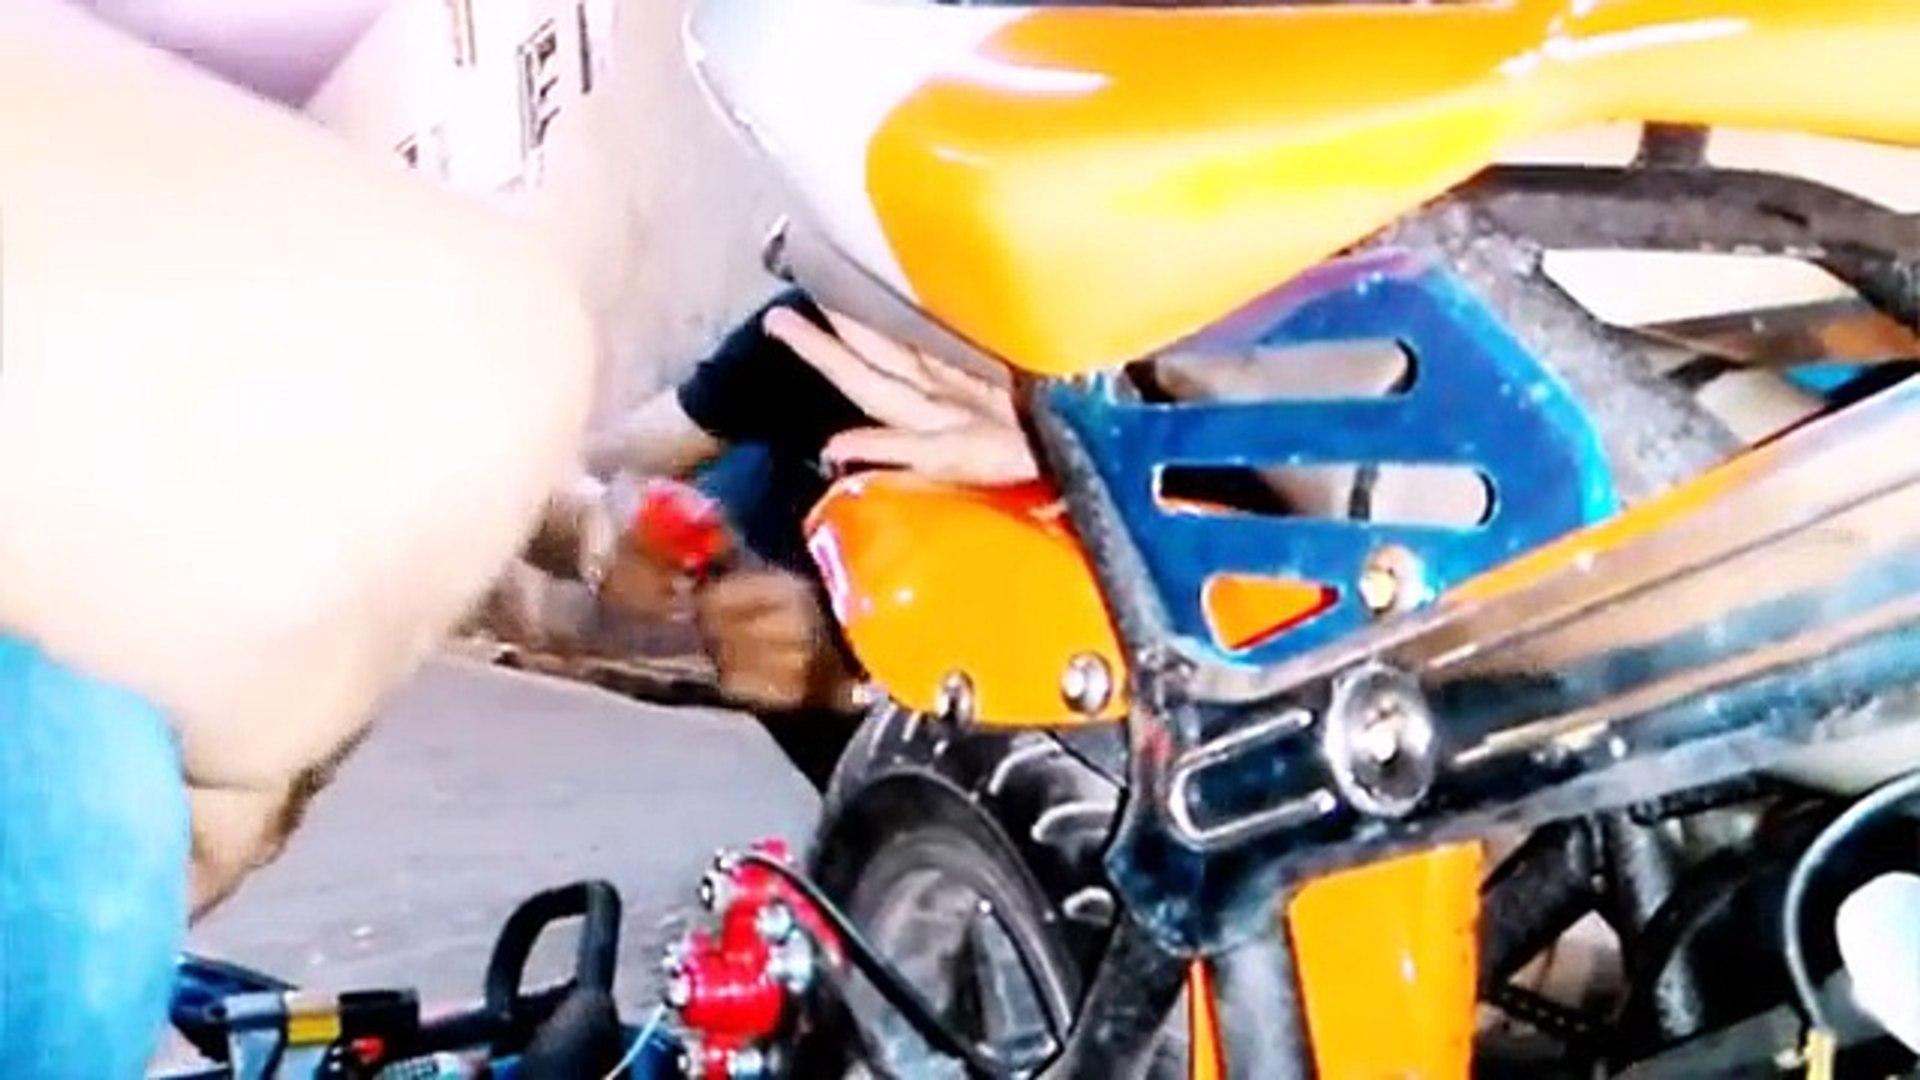 Motor Gp Ducatay Vs Trail Klewang At Menteng Video Dailymotion